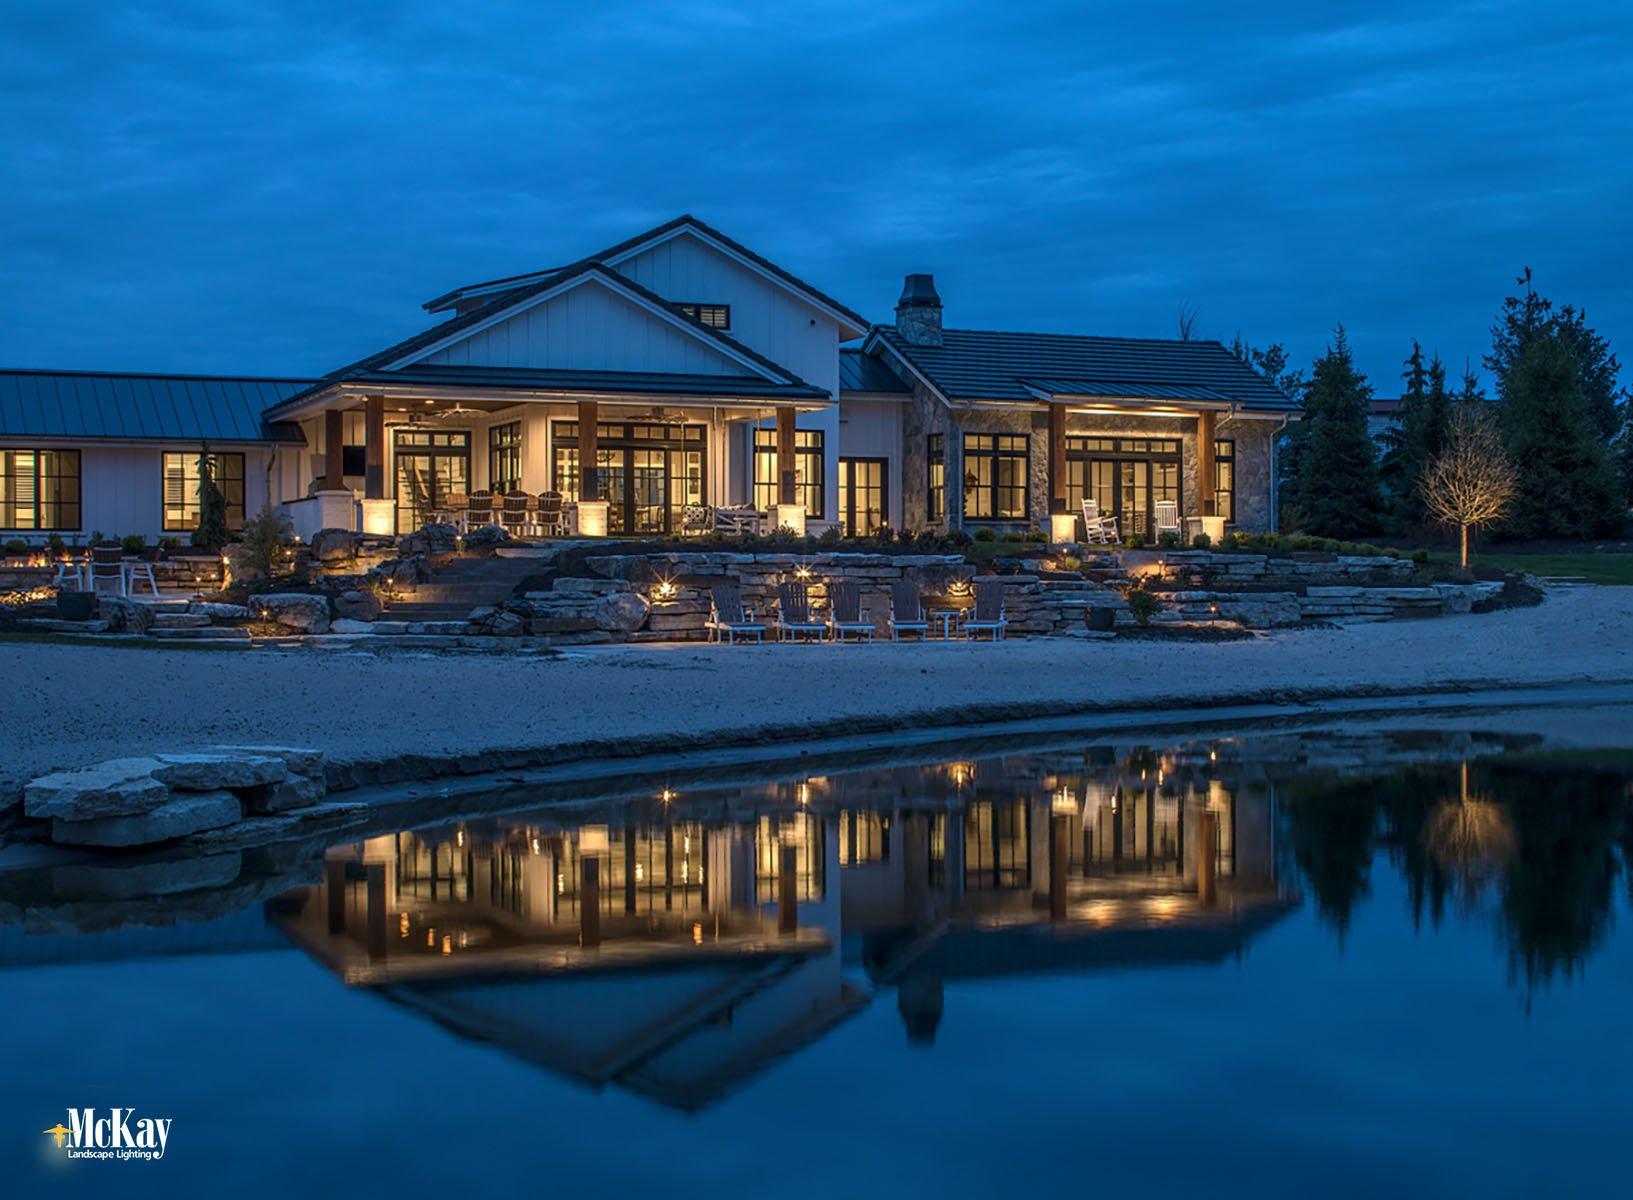 Simple & Elegant Lake House Outdoor Lighting Design Ideas  Bluewater Lake Valley Nebraska McKay Landscape Lighting